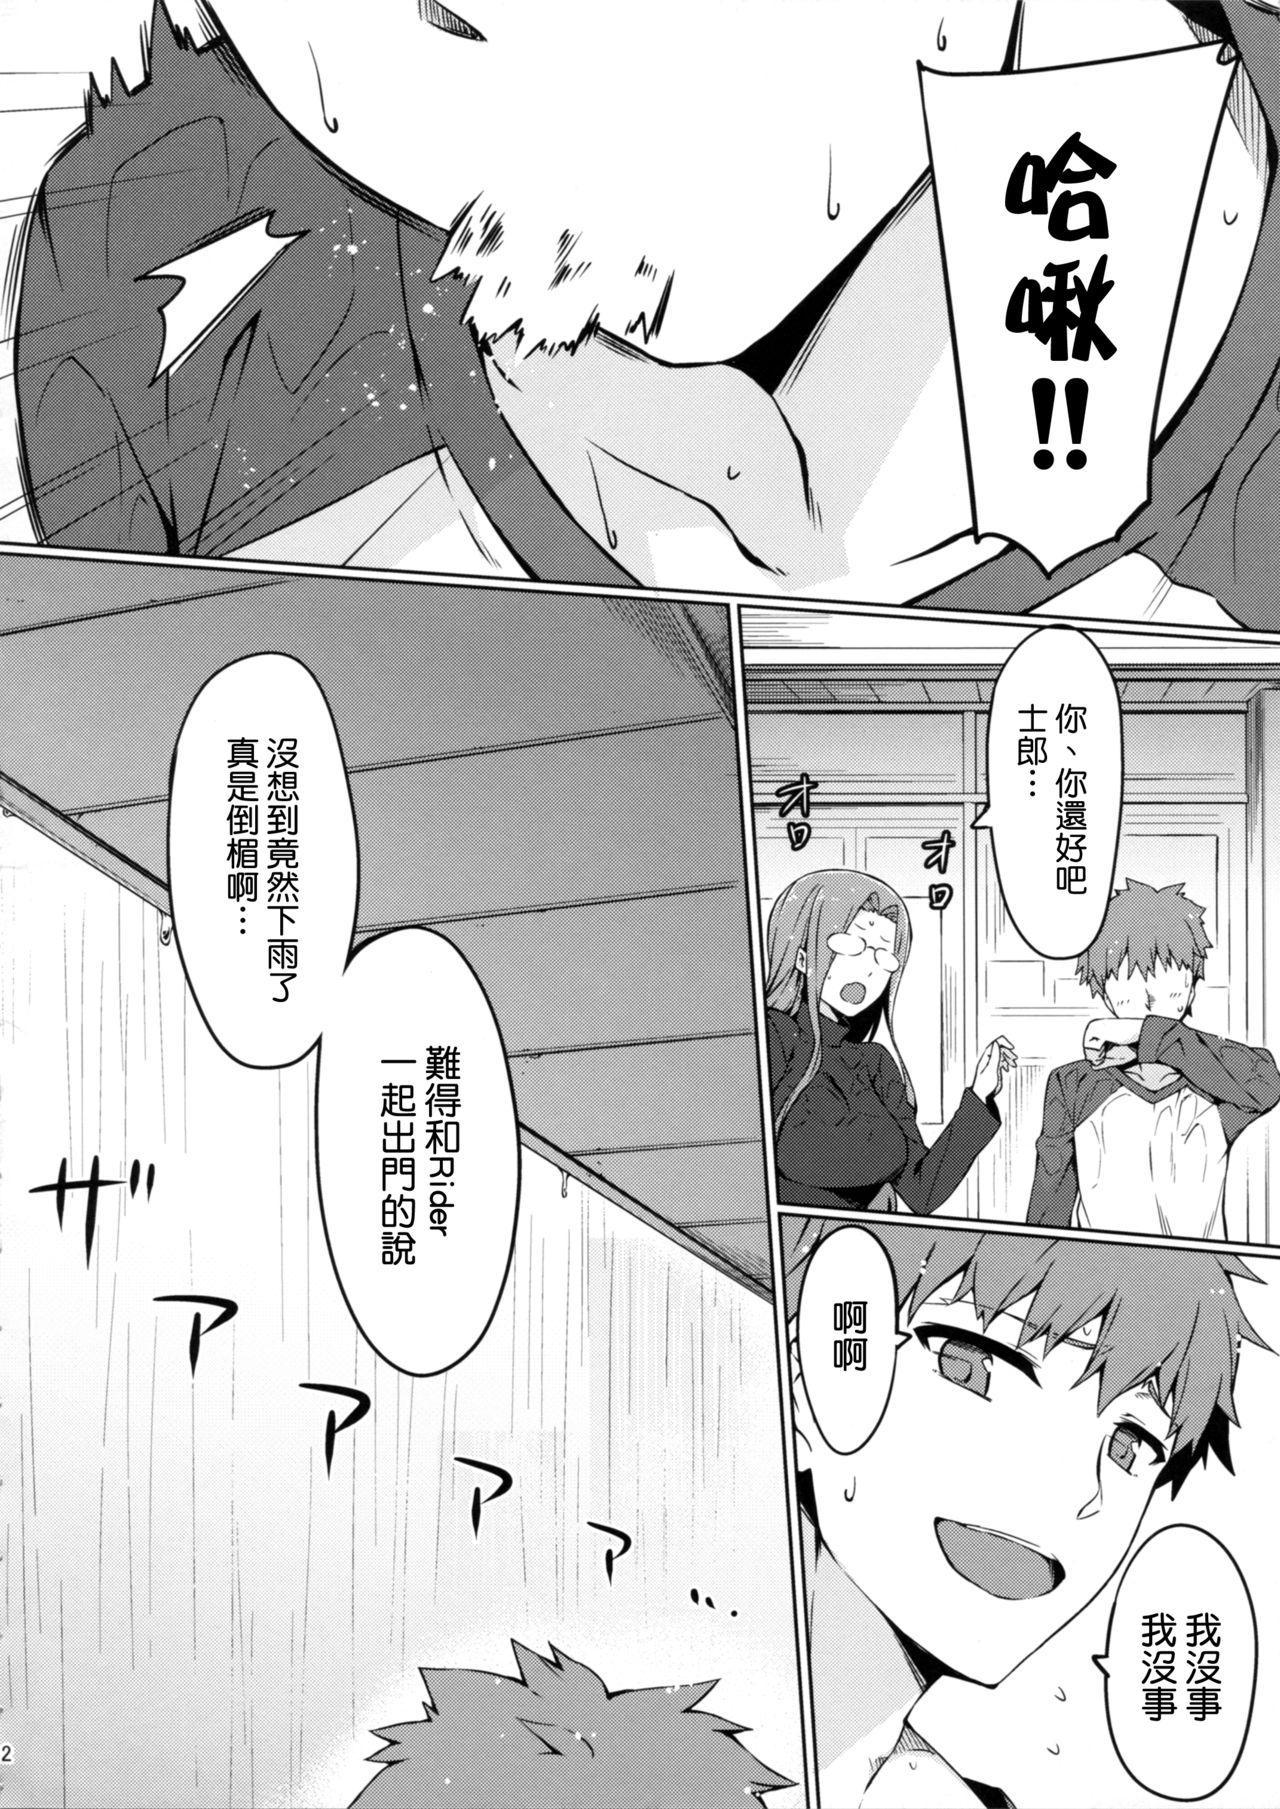 Rider-san to Love Hotel. 3